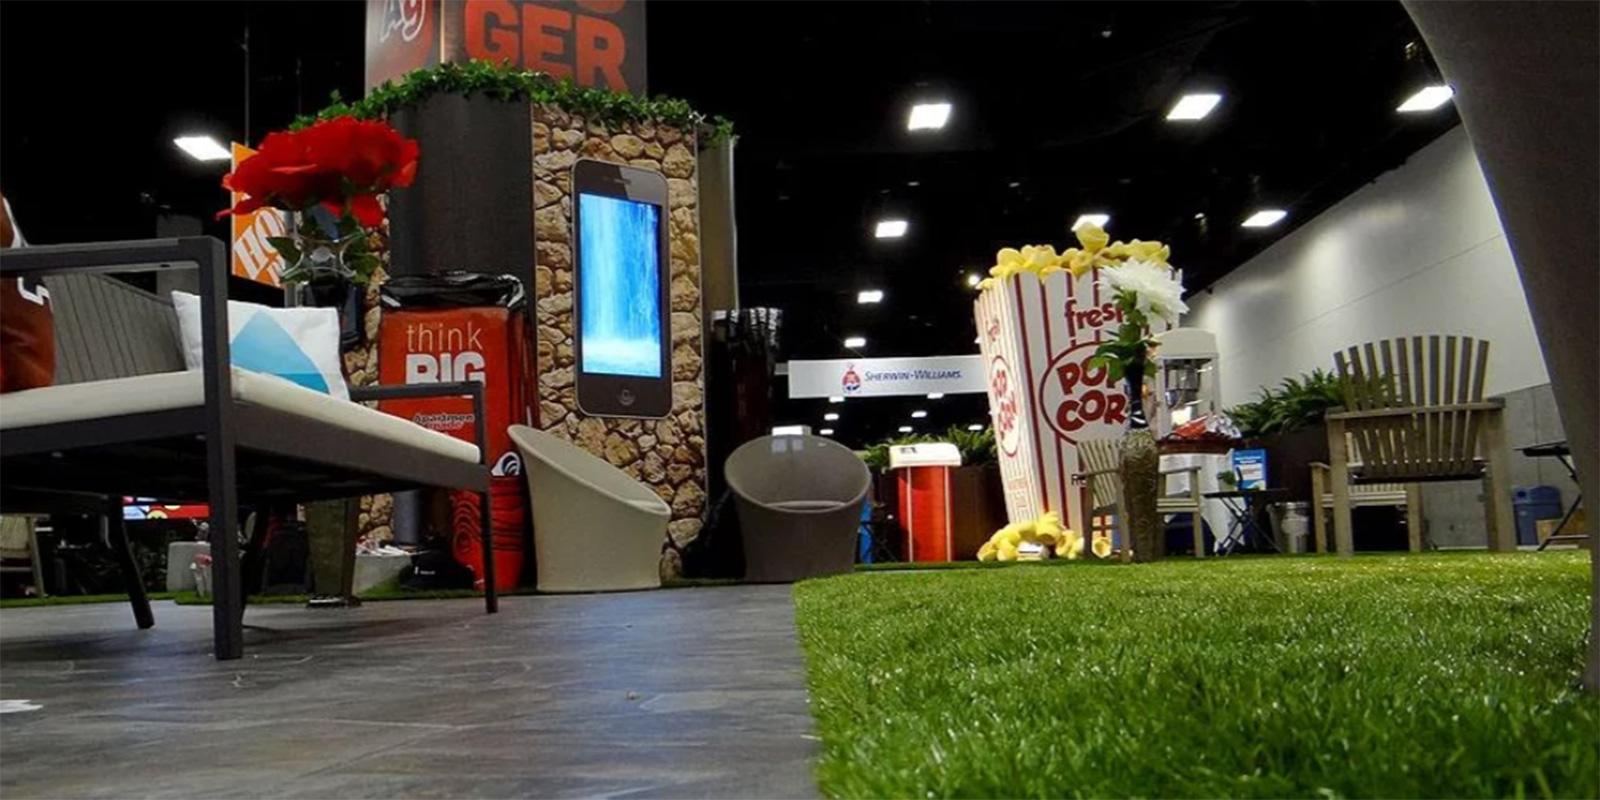 artificial grass | Trade Show & Event Flooring | High-Quality Flooring Solutions